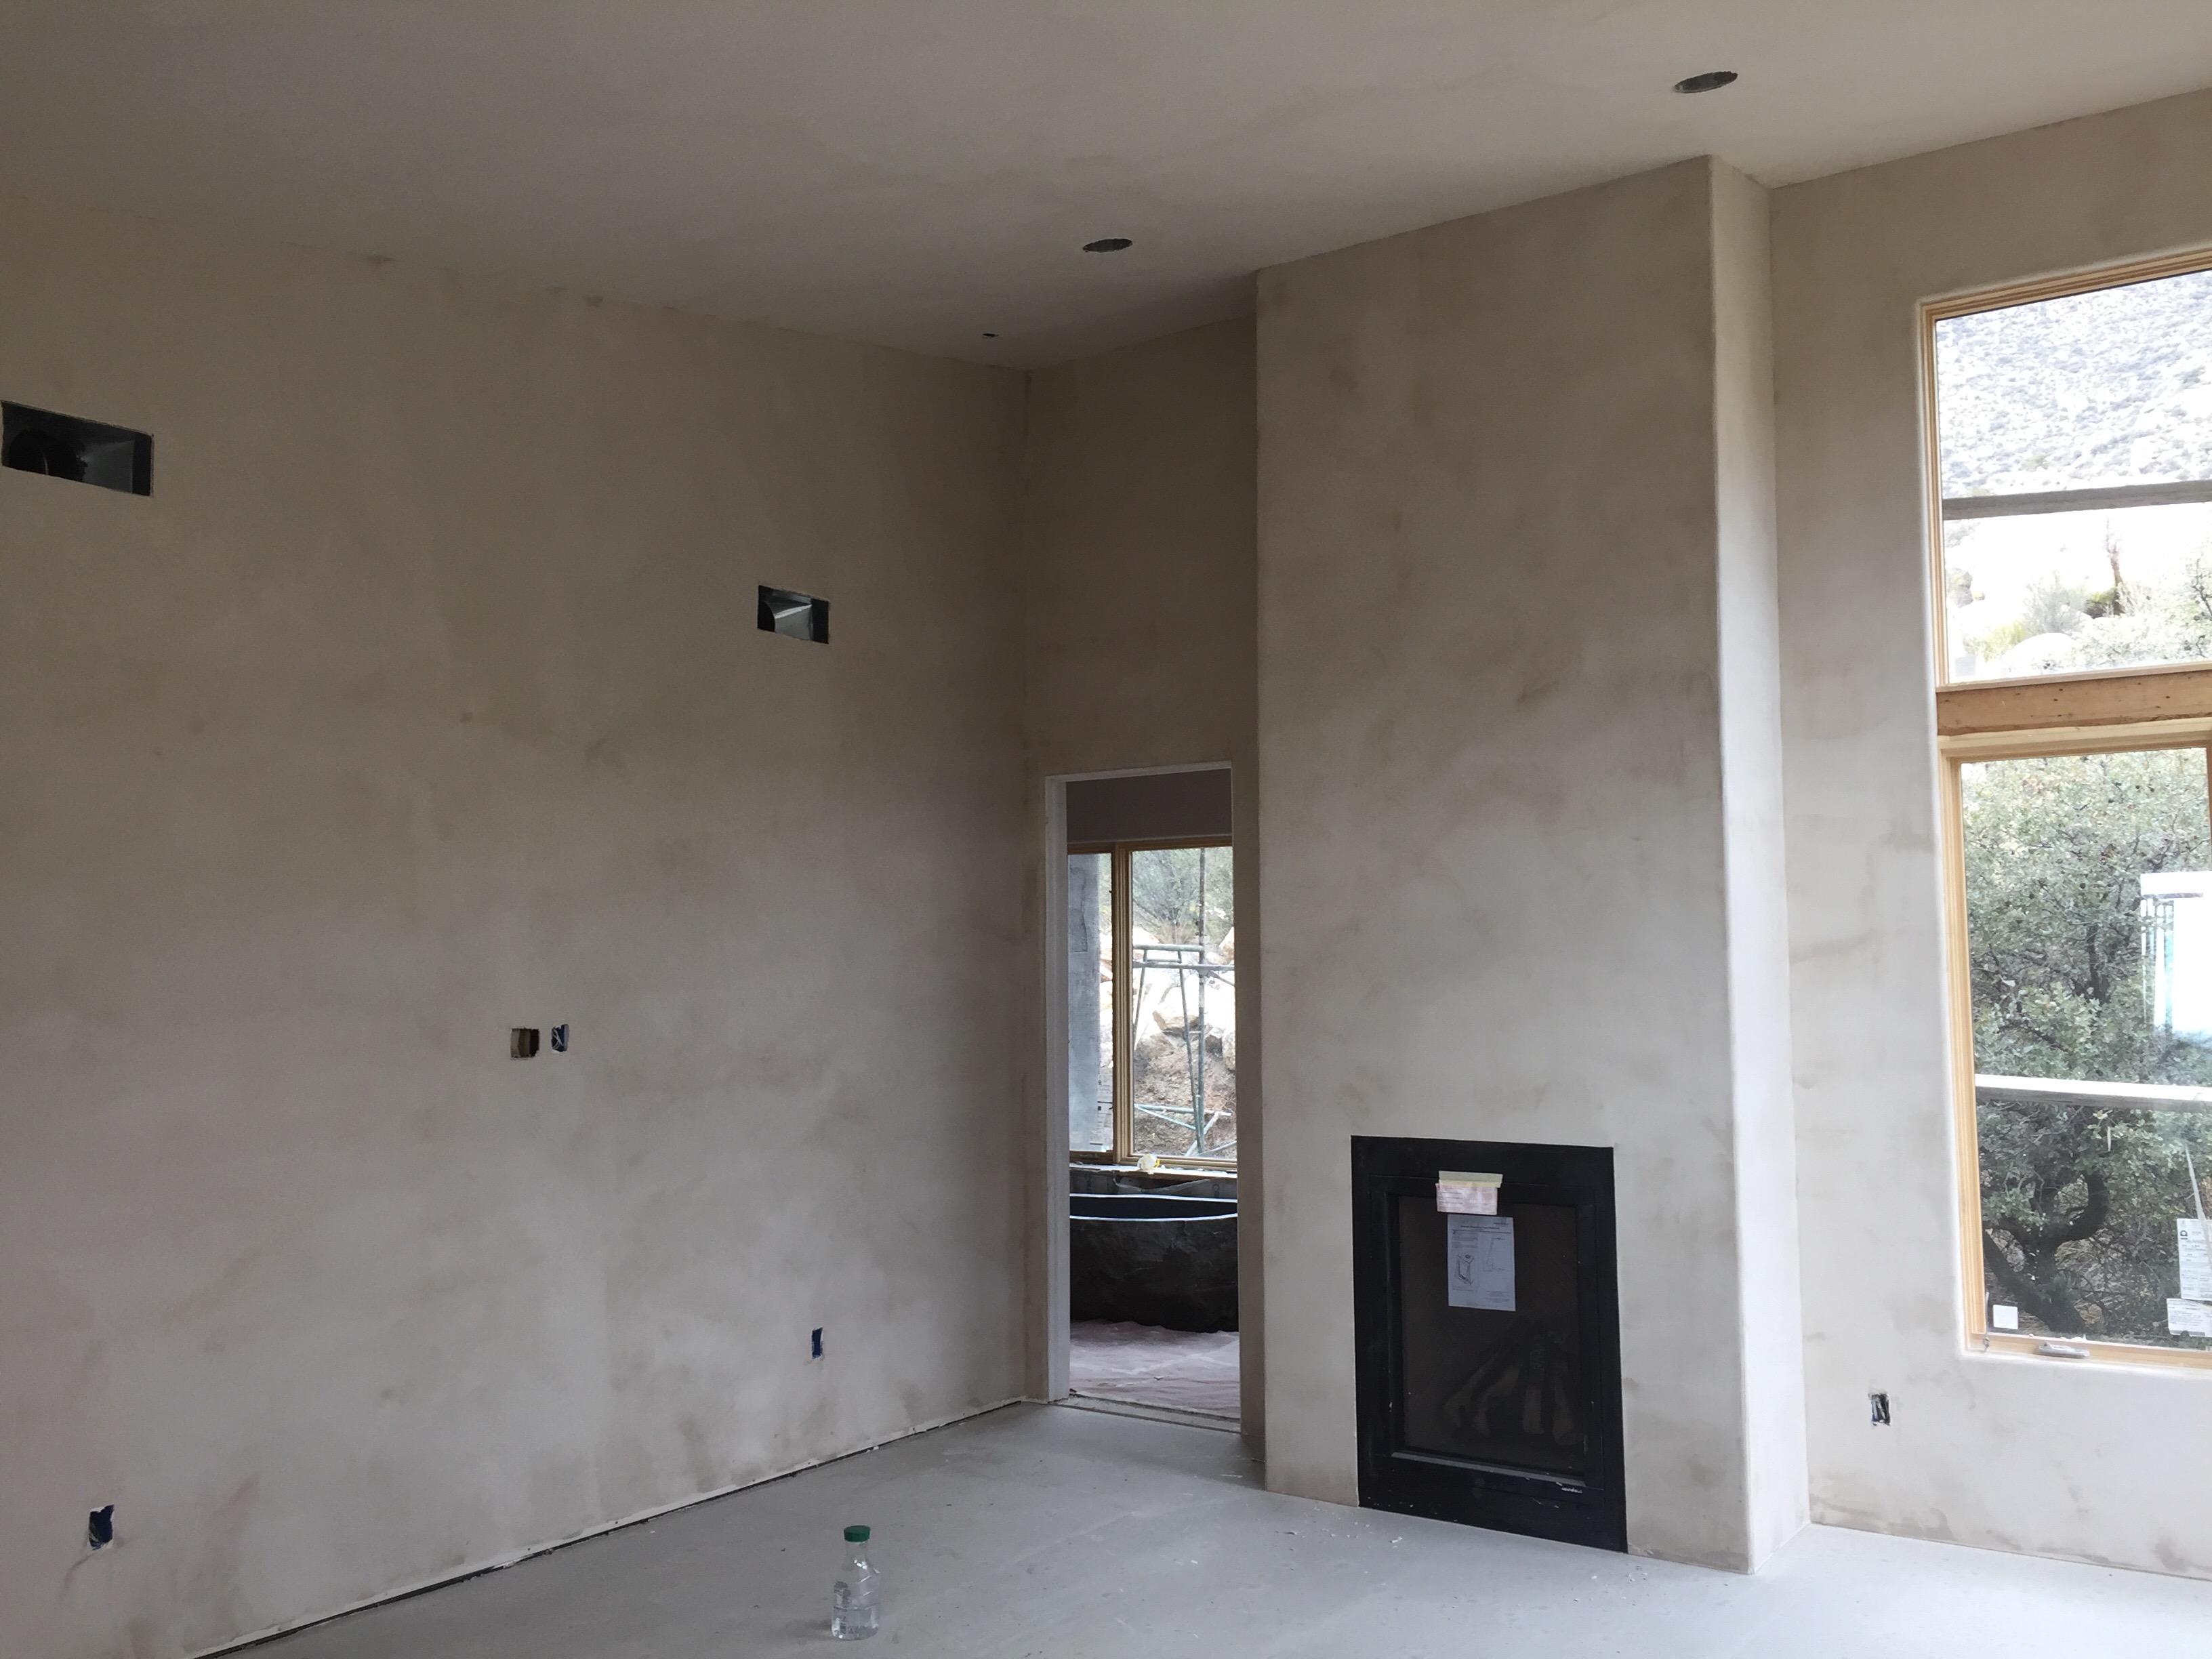 Adding Silica Sand To Drywall Mud Page 3 Drywall